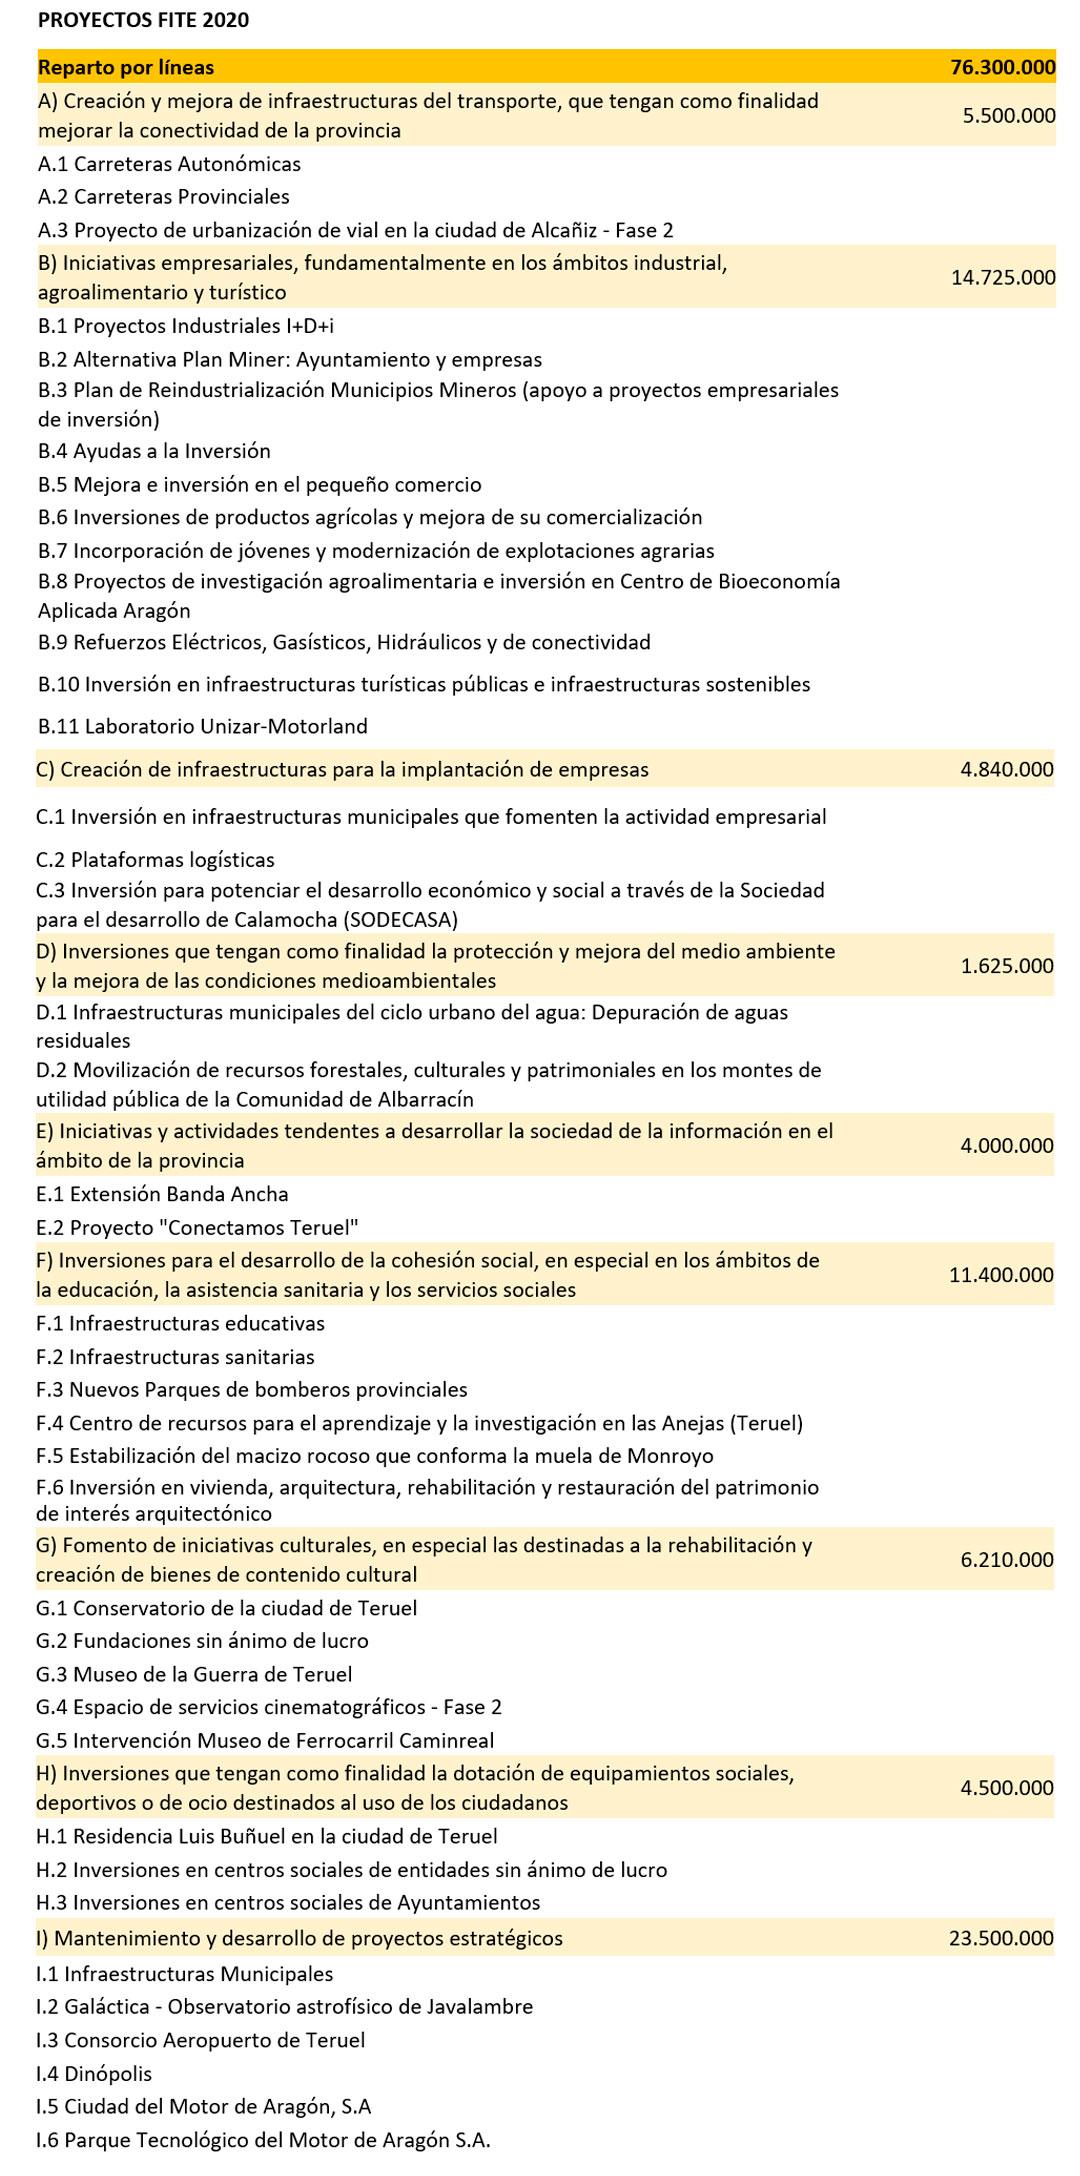 Proyectos-FITE-2020